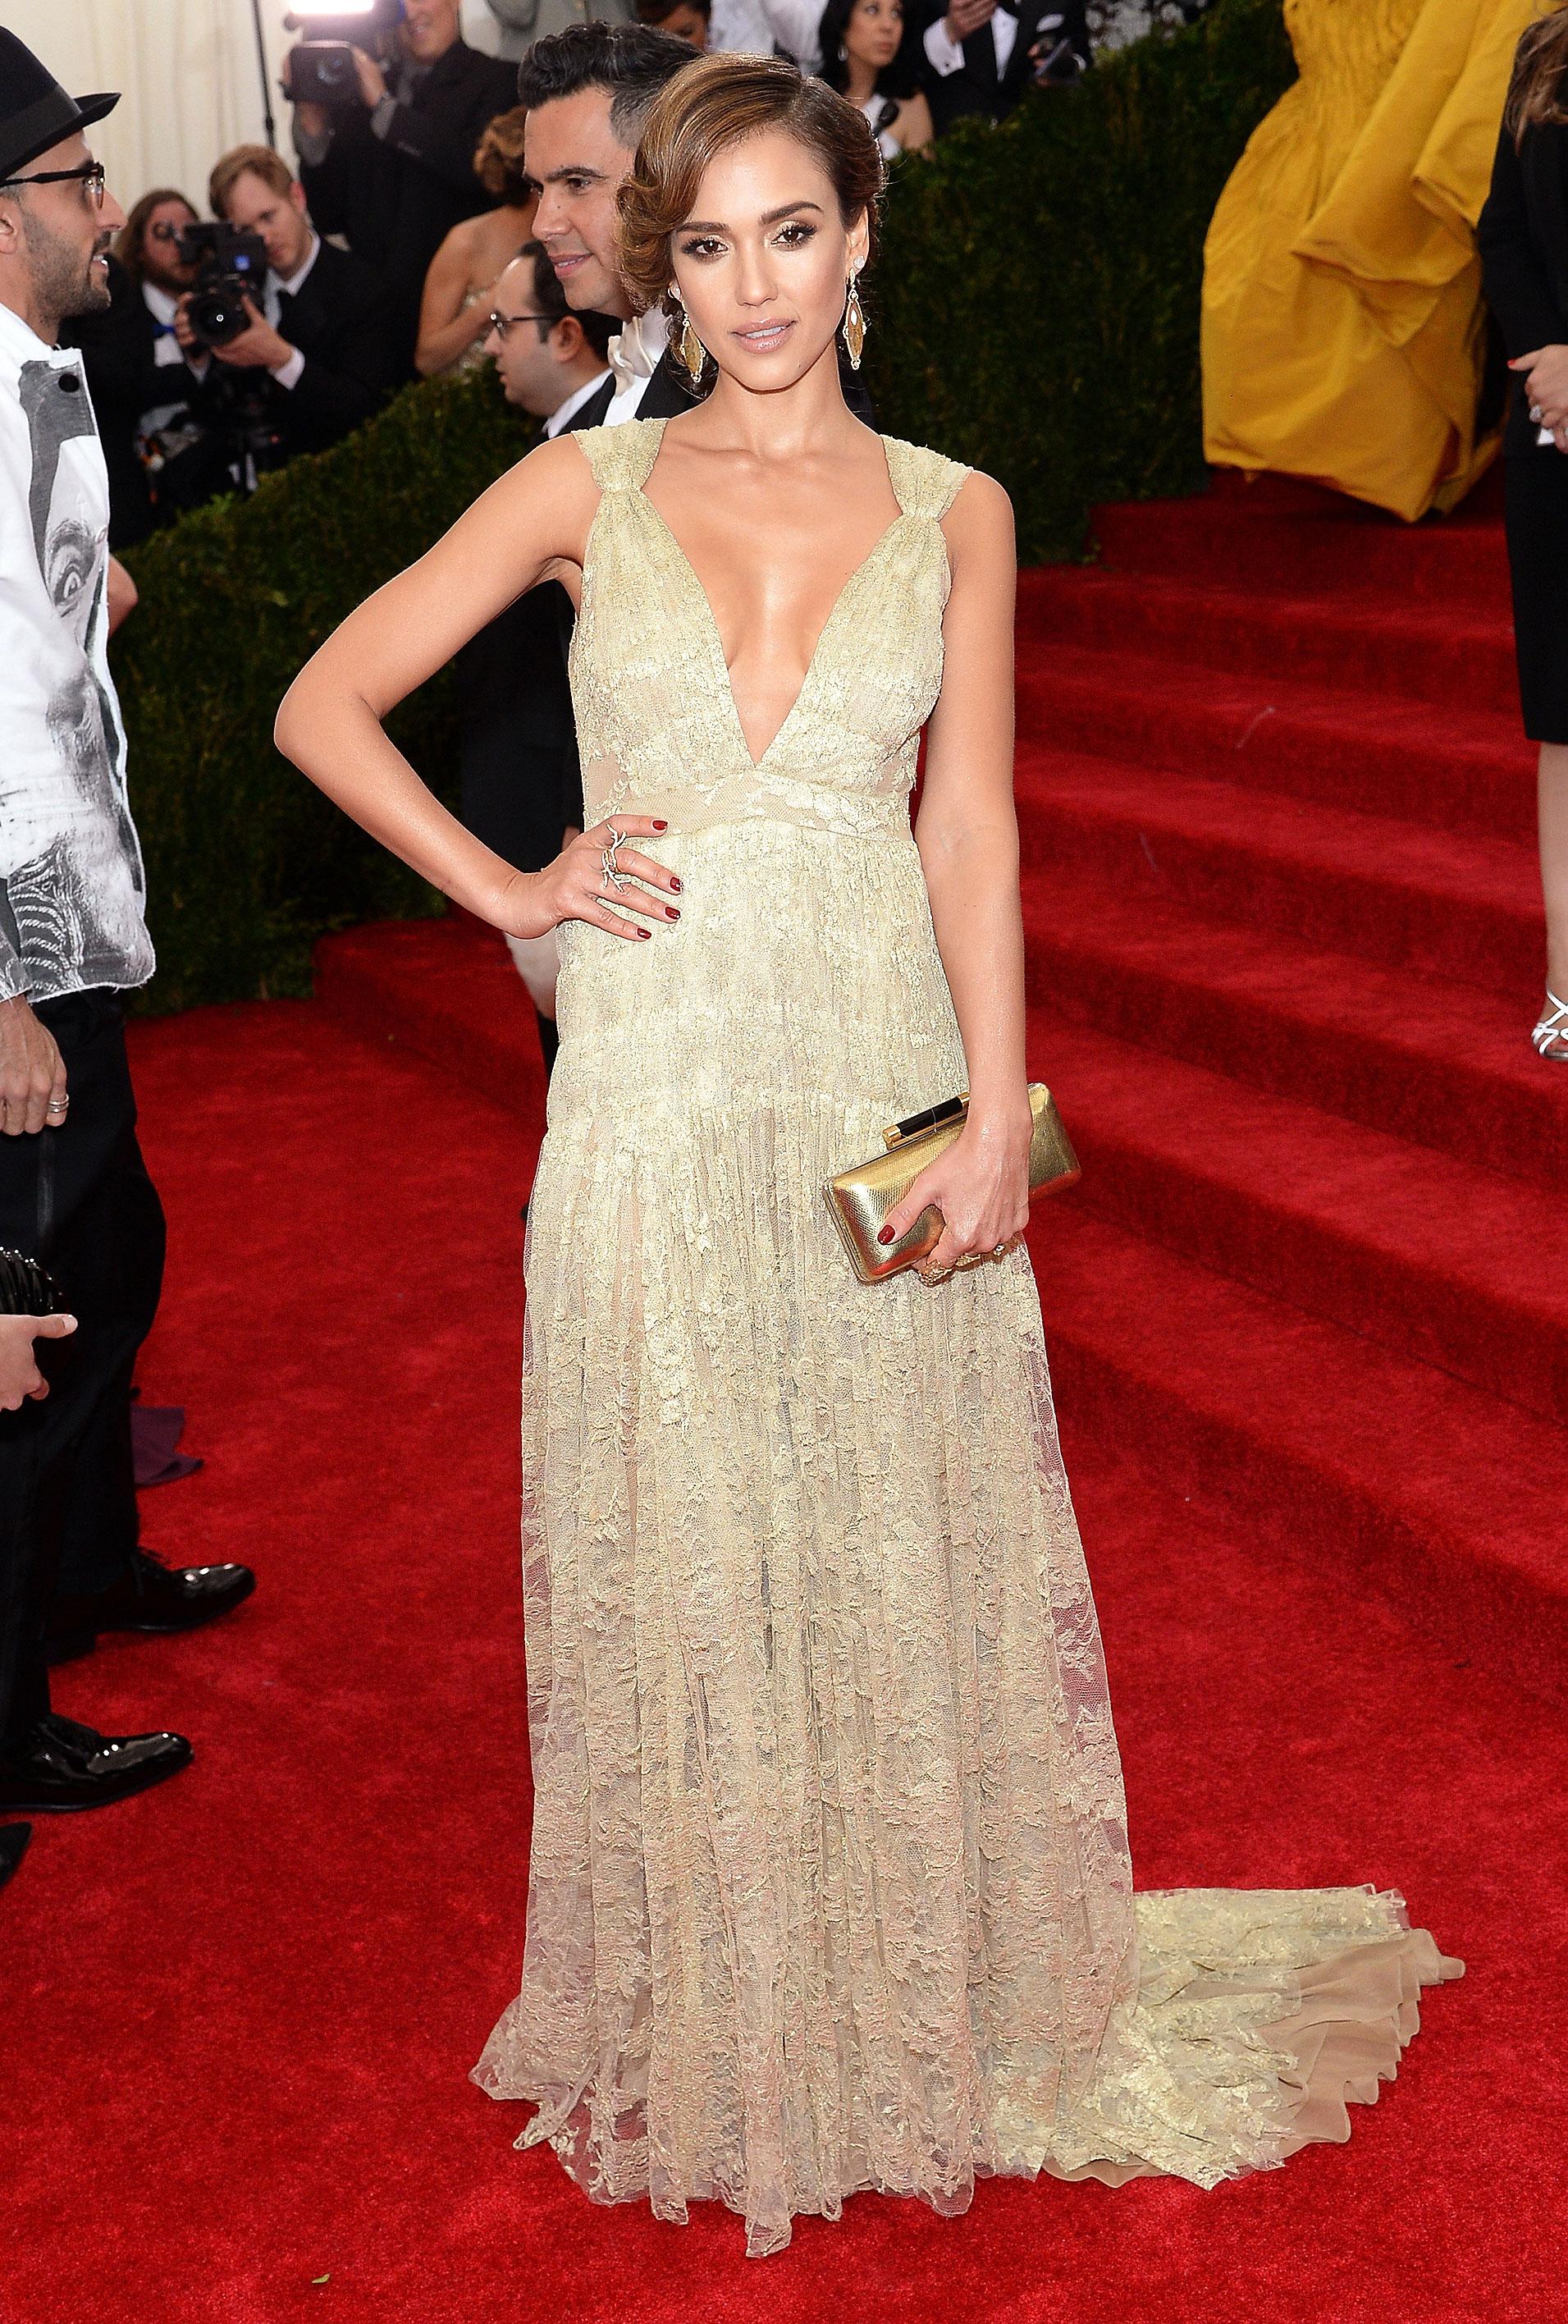 Jessica Alba s Best Red Carpet Dresses Fashion Moments